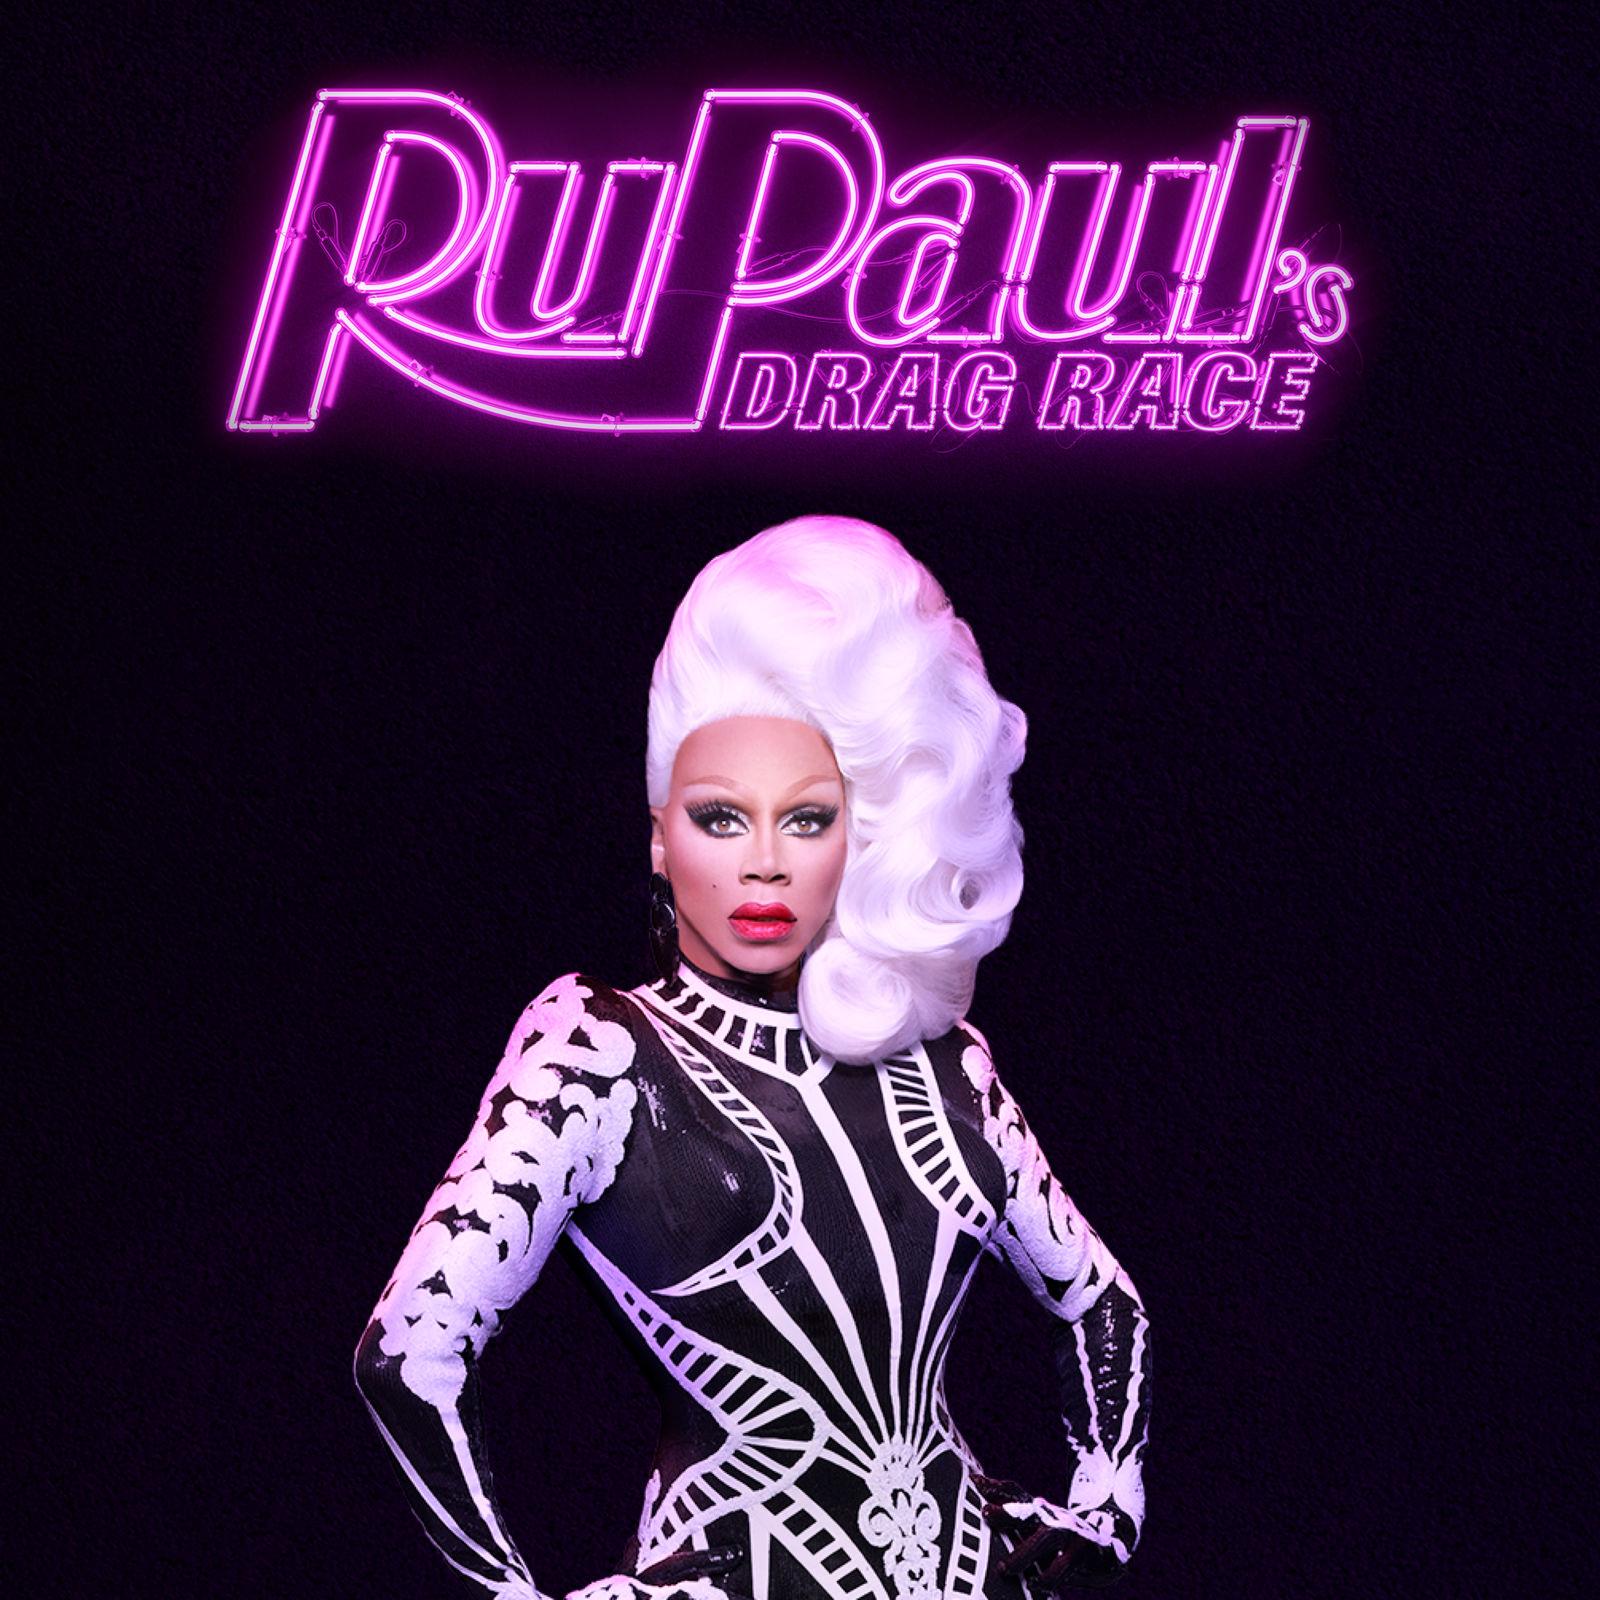 rupauls drag race season 9 episode 1 torrent